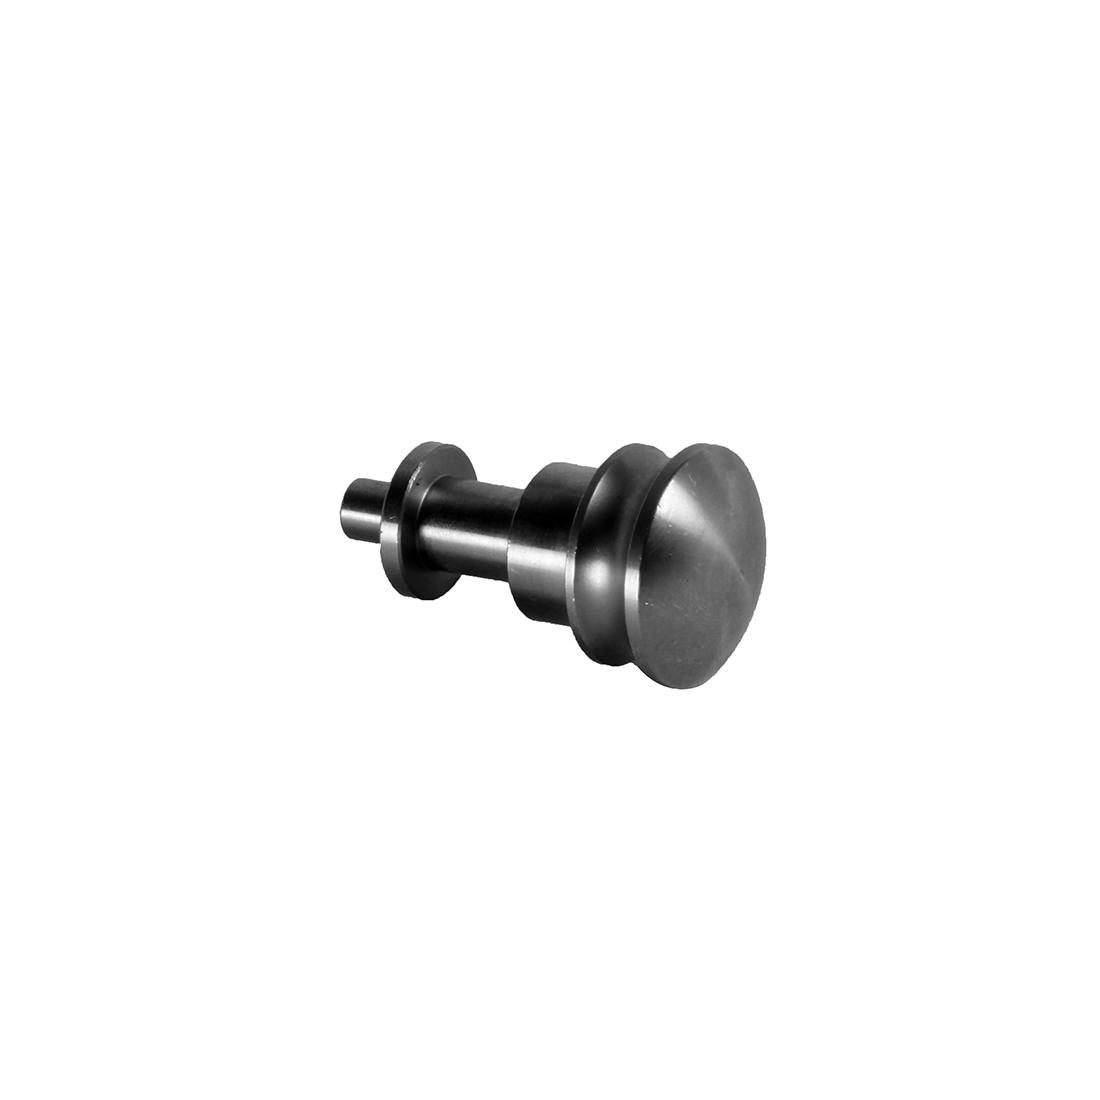 Knob for Vegetable Slicer Attachment P-1007